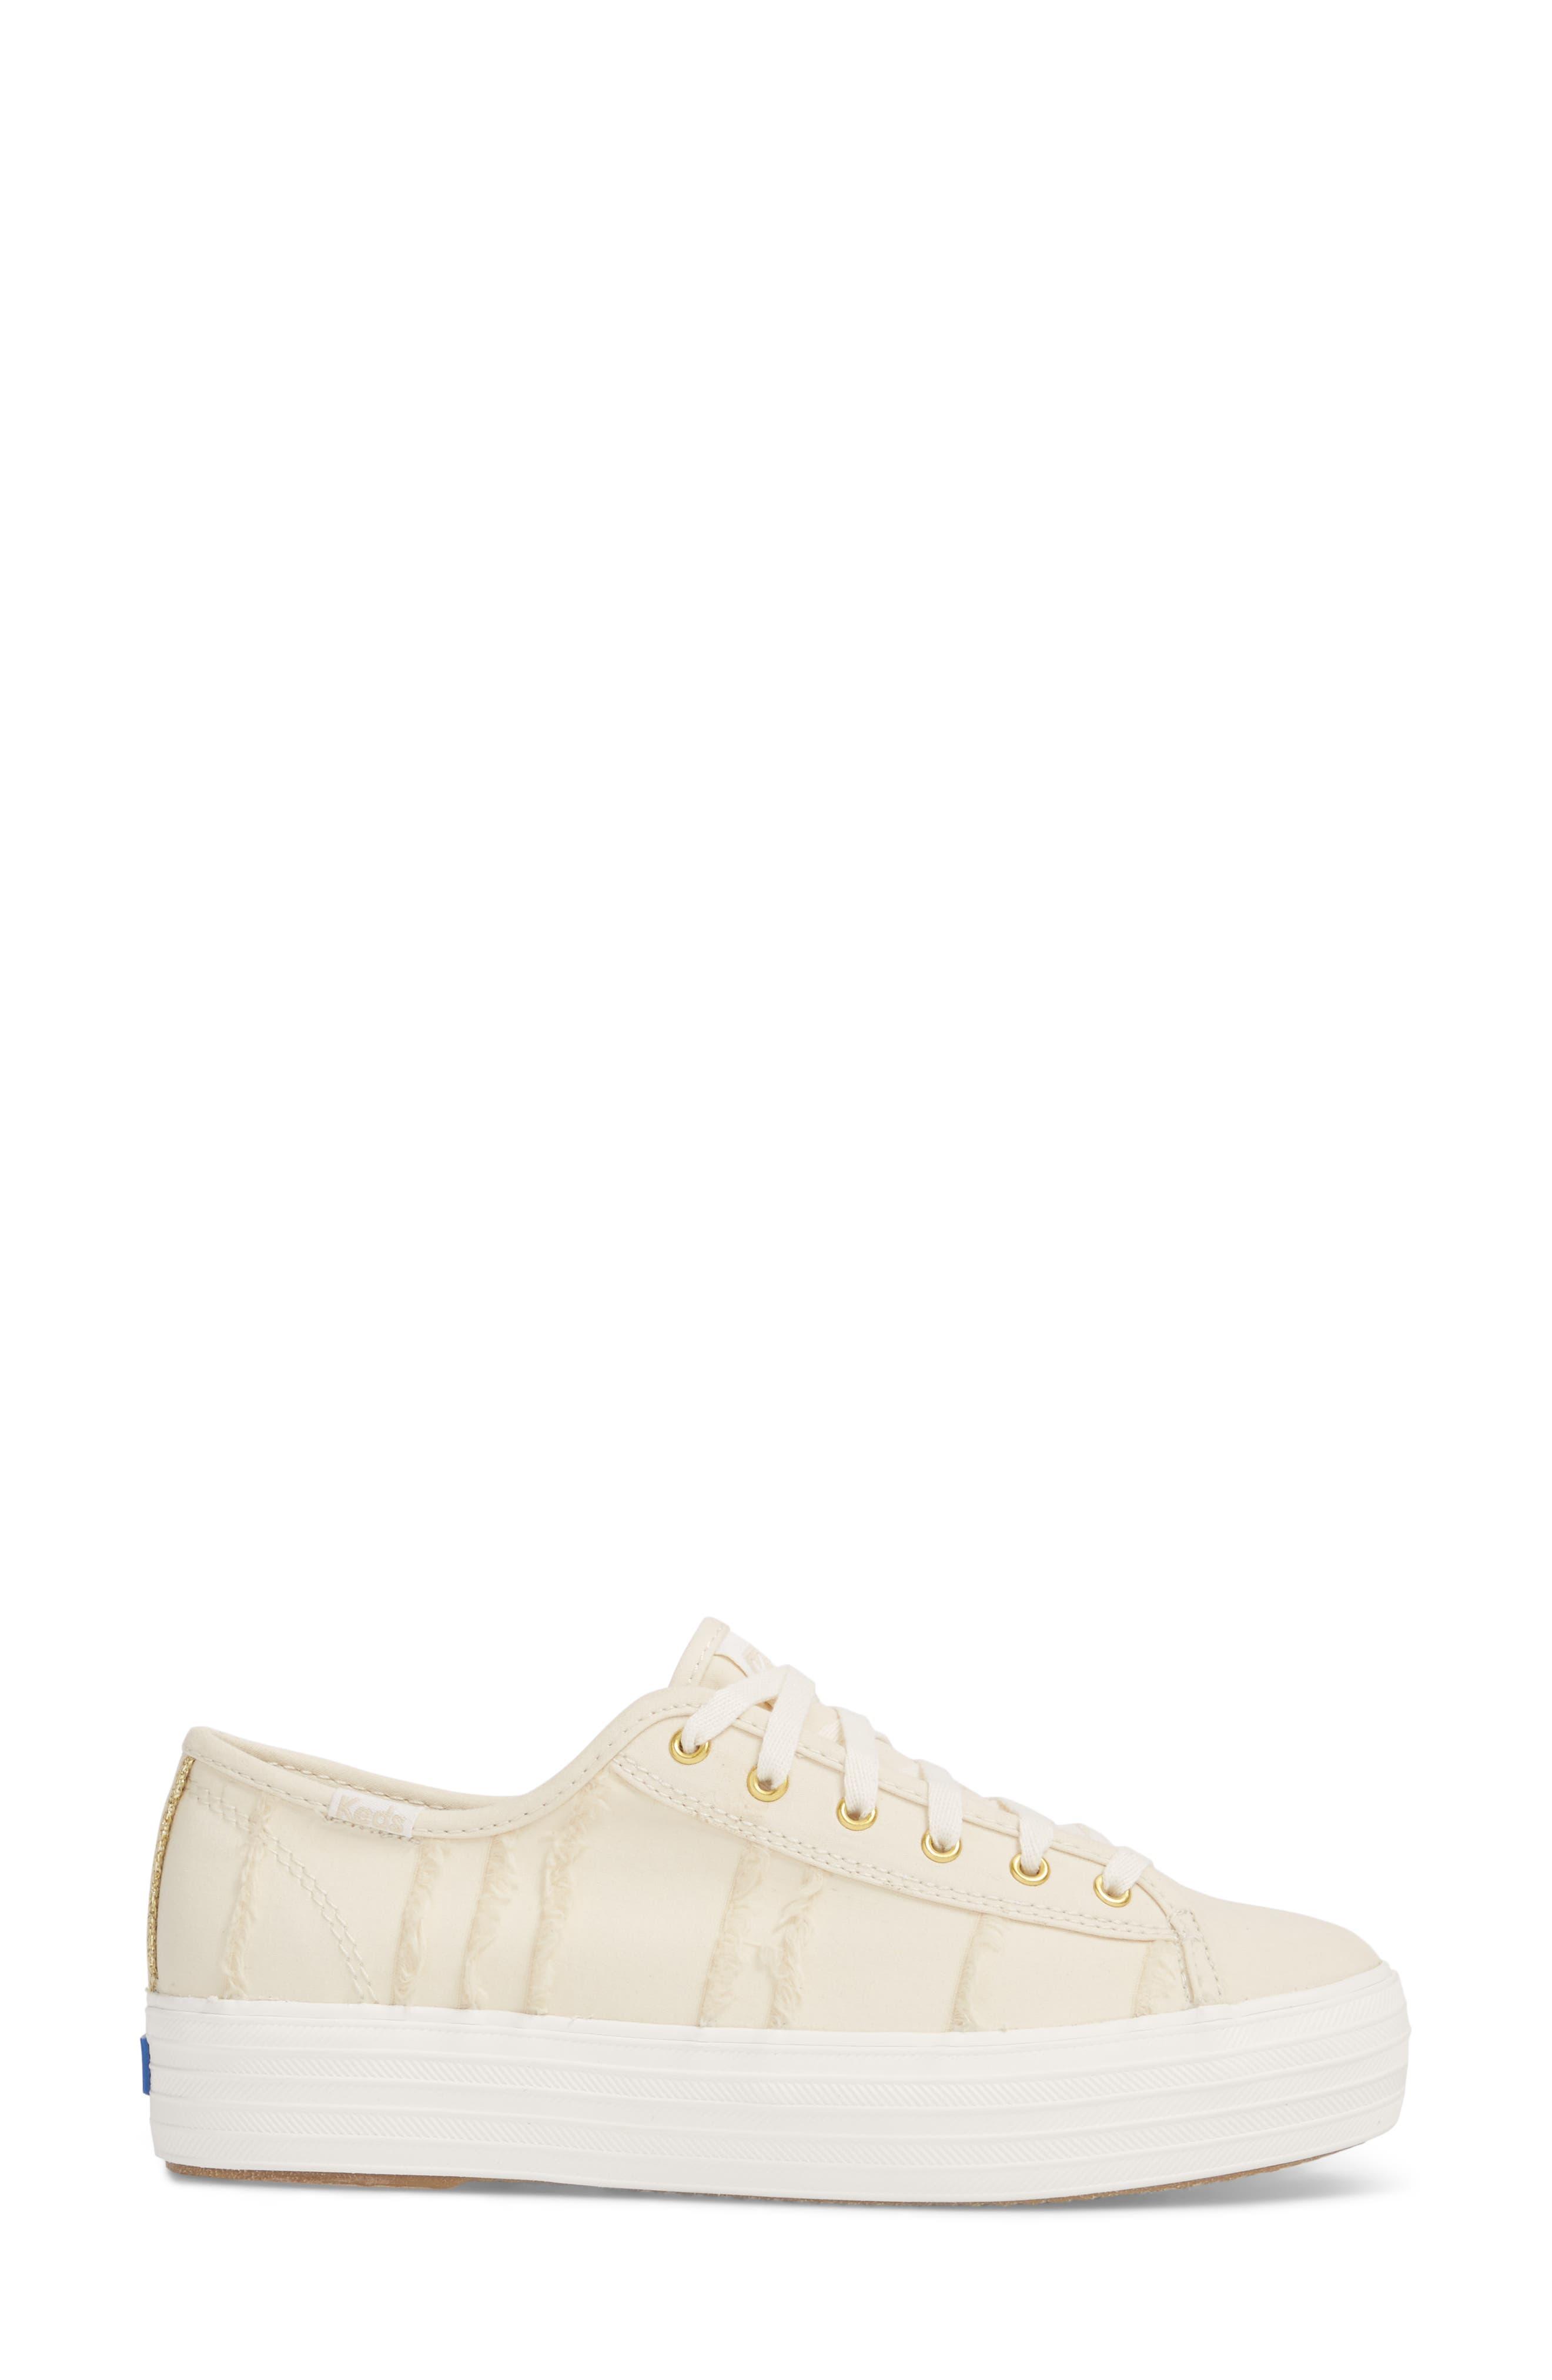 Triple Kick Canvas Sneaker,                             Alternate thumbnail 3, color,                             900